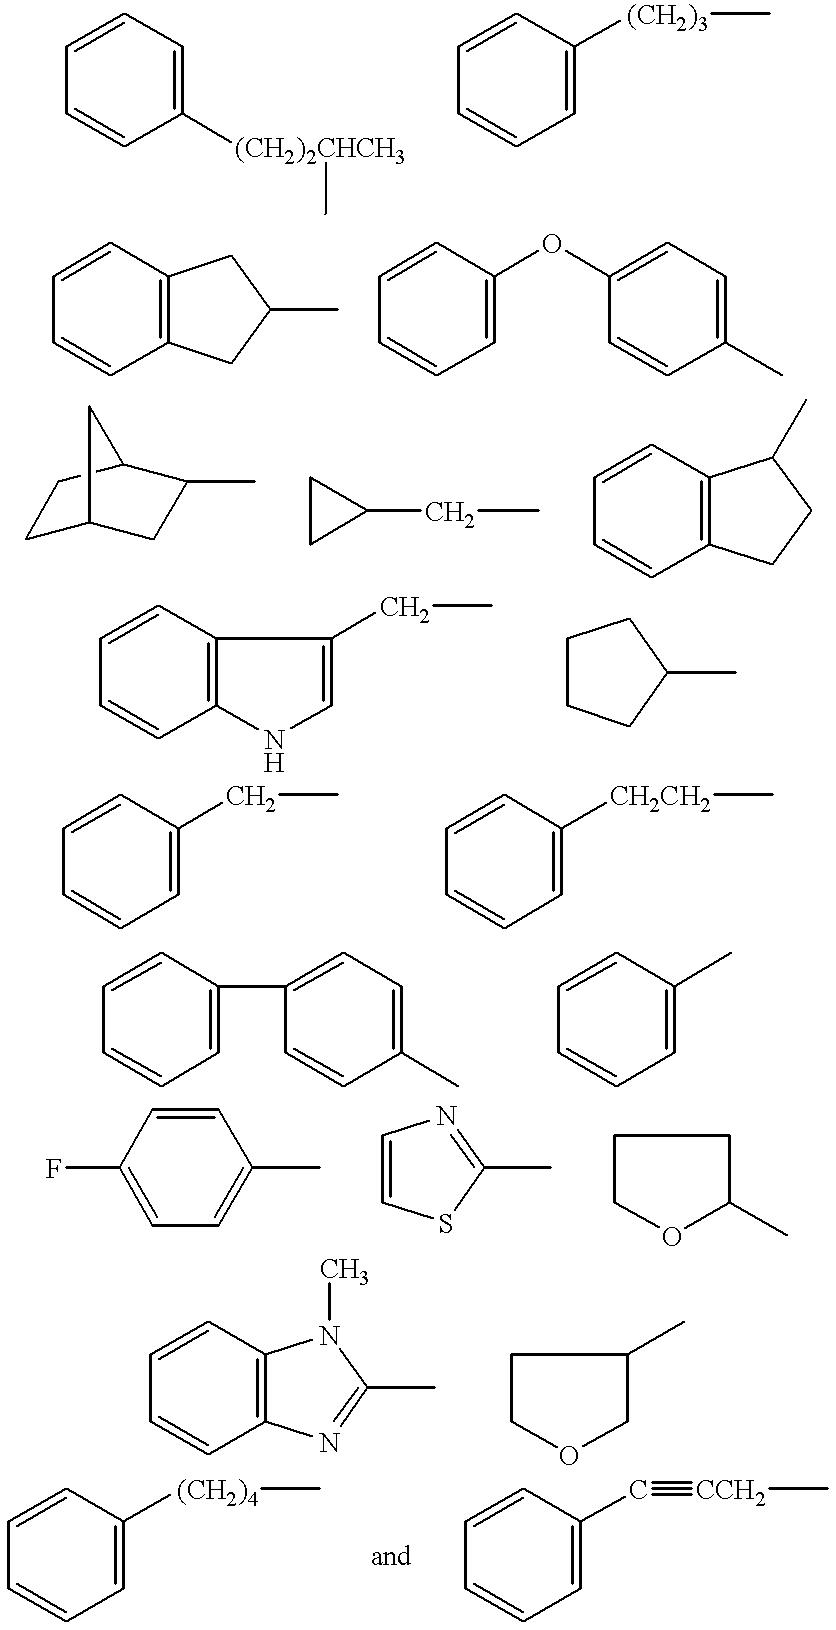 Phenyl Group vs Benzyl Group Phenyl Group vs Benzyl Group